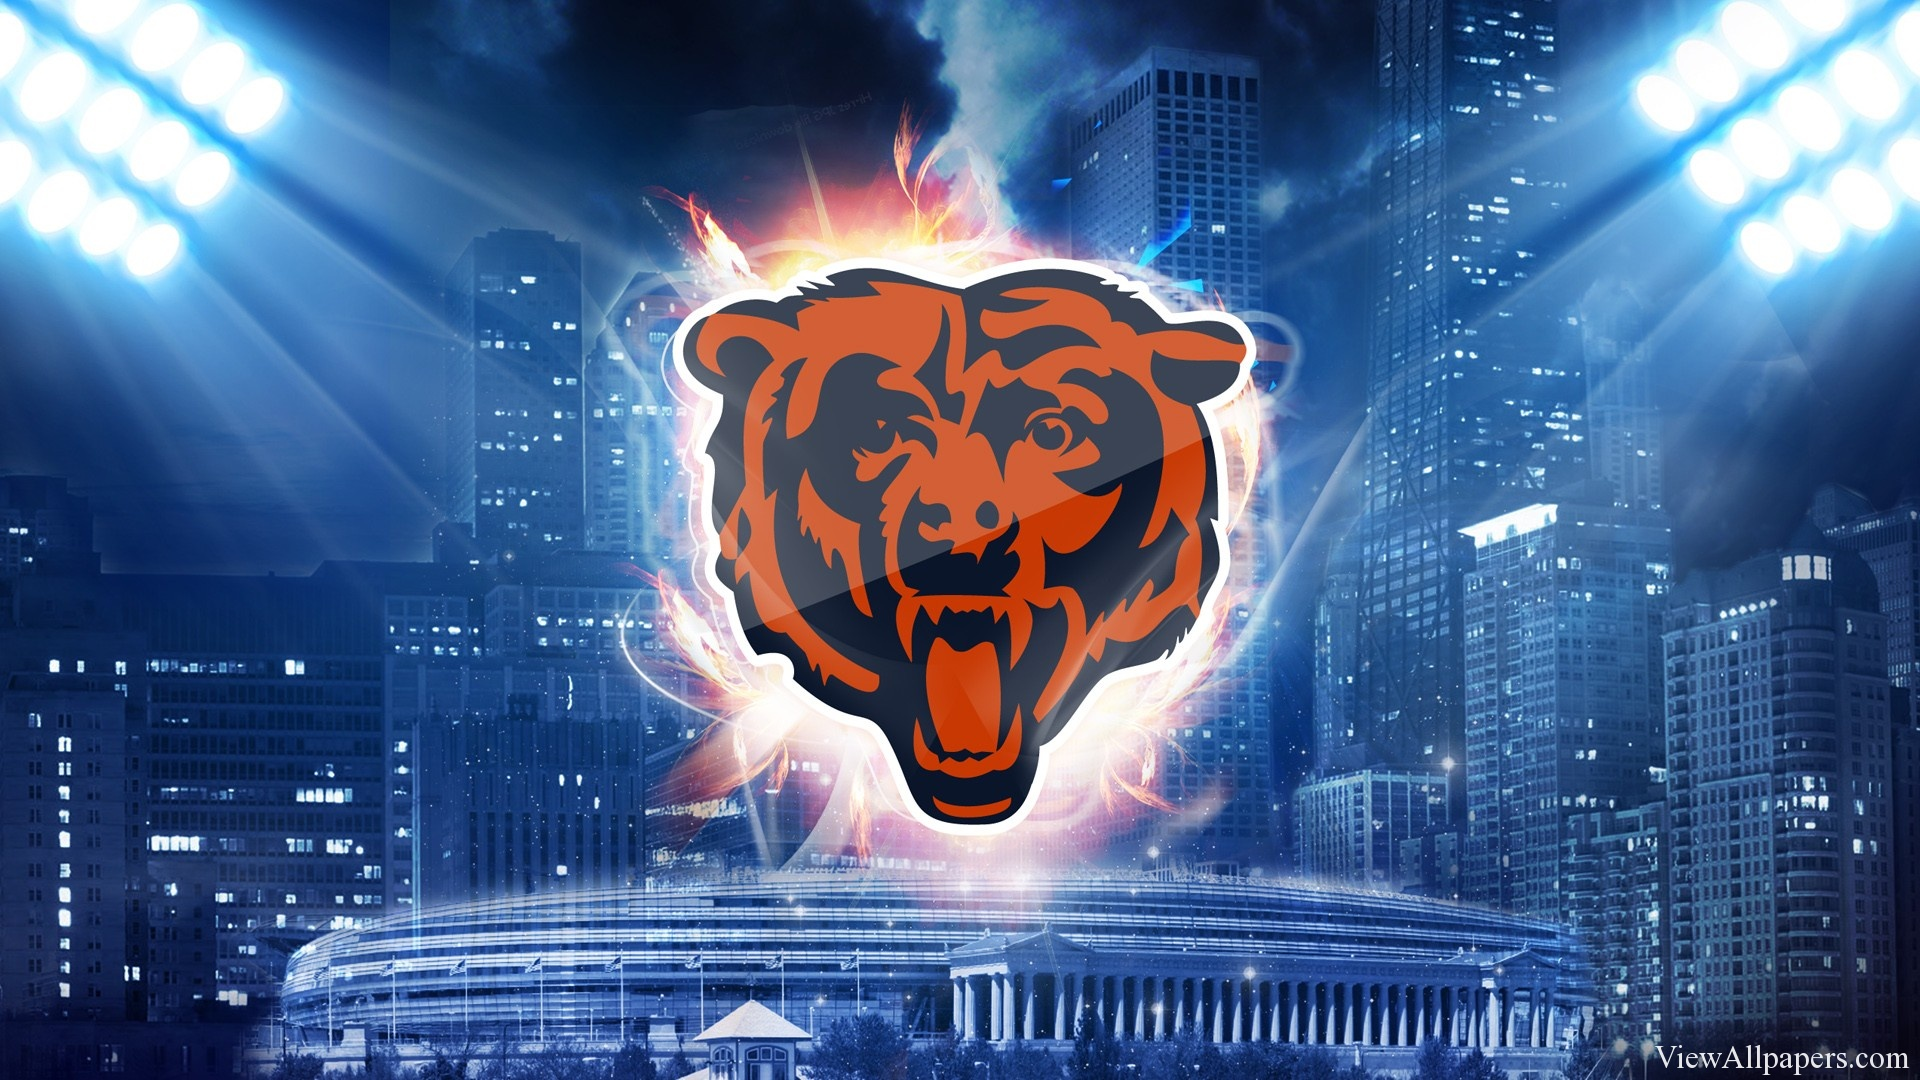 Chicago Bears Logo HD Wallpaper NFL HD Wallpapers 1920x1080